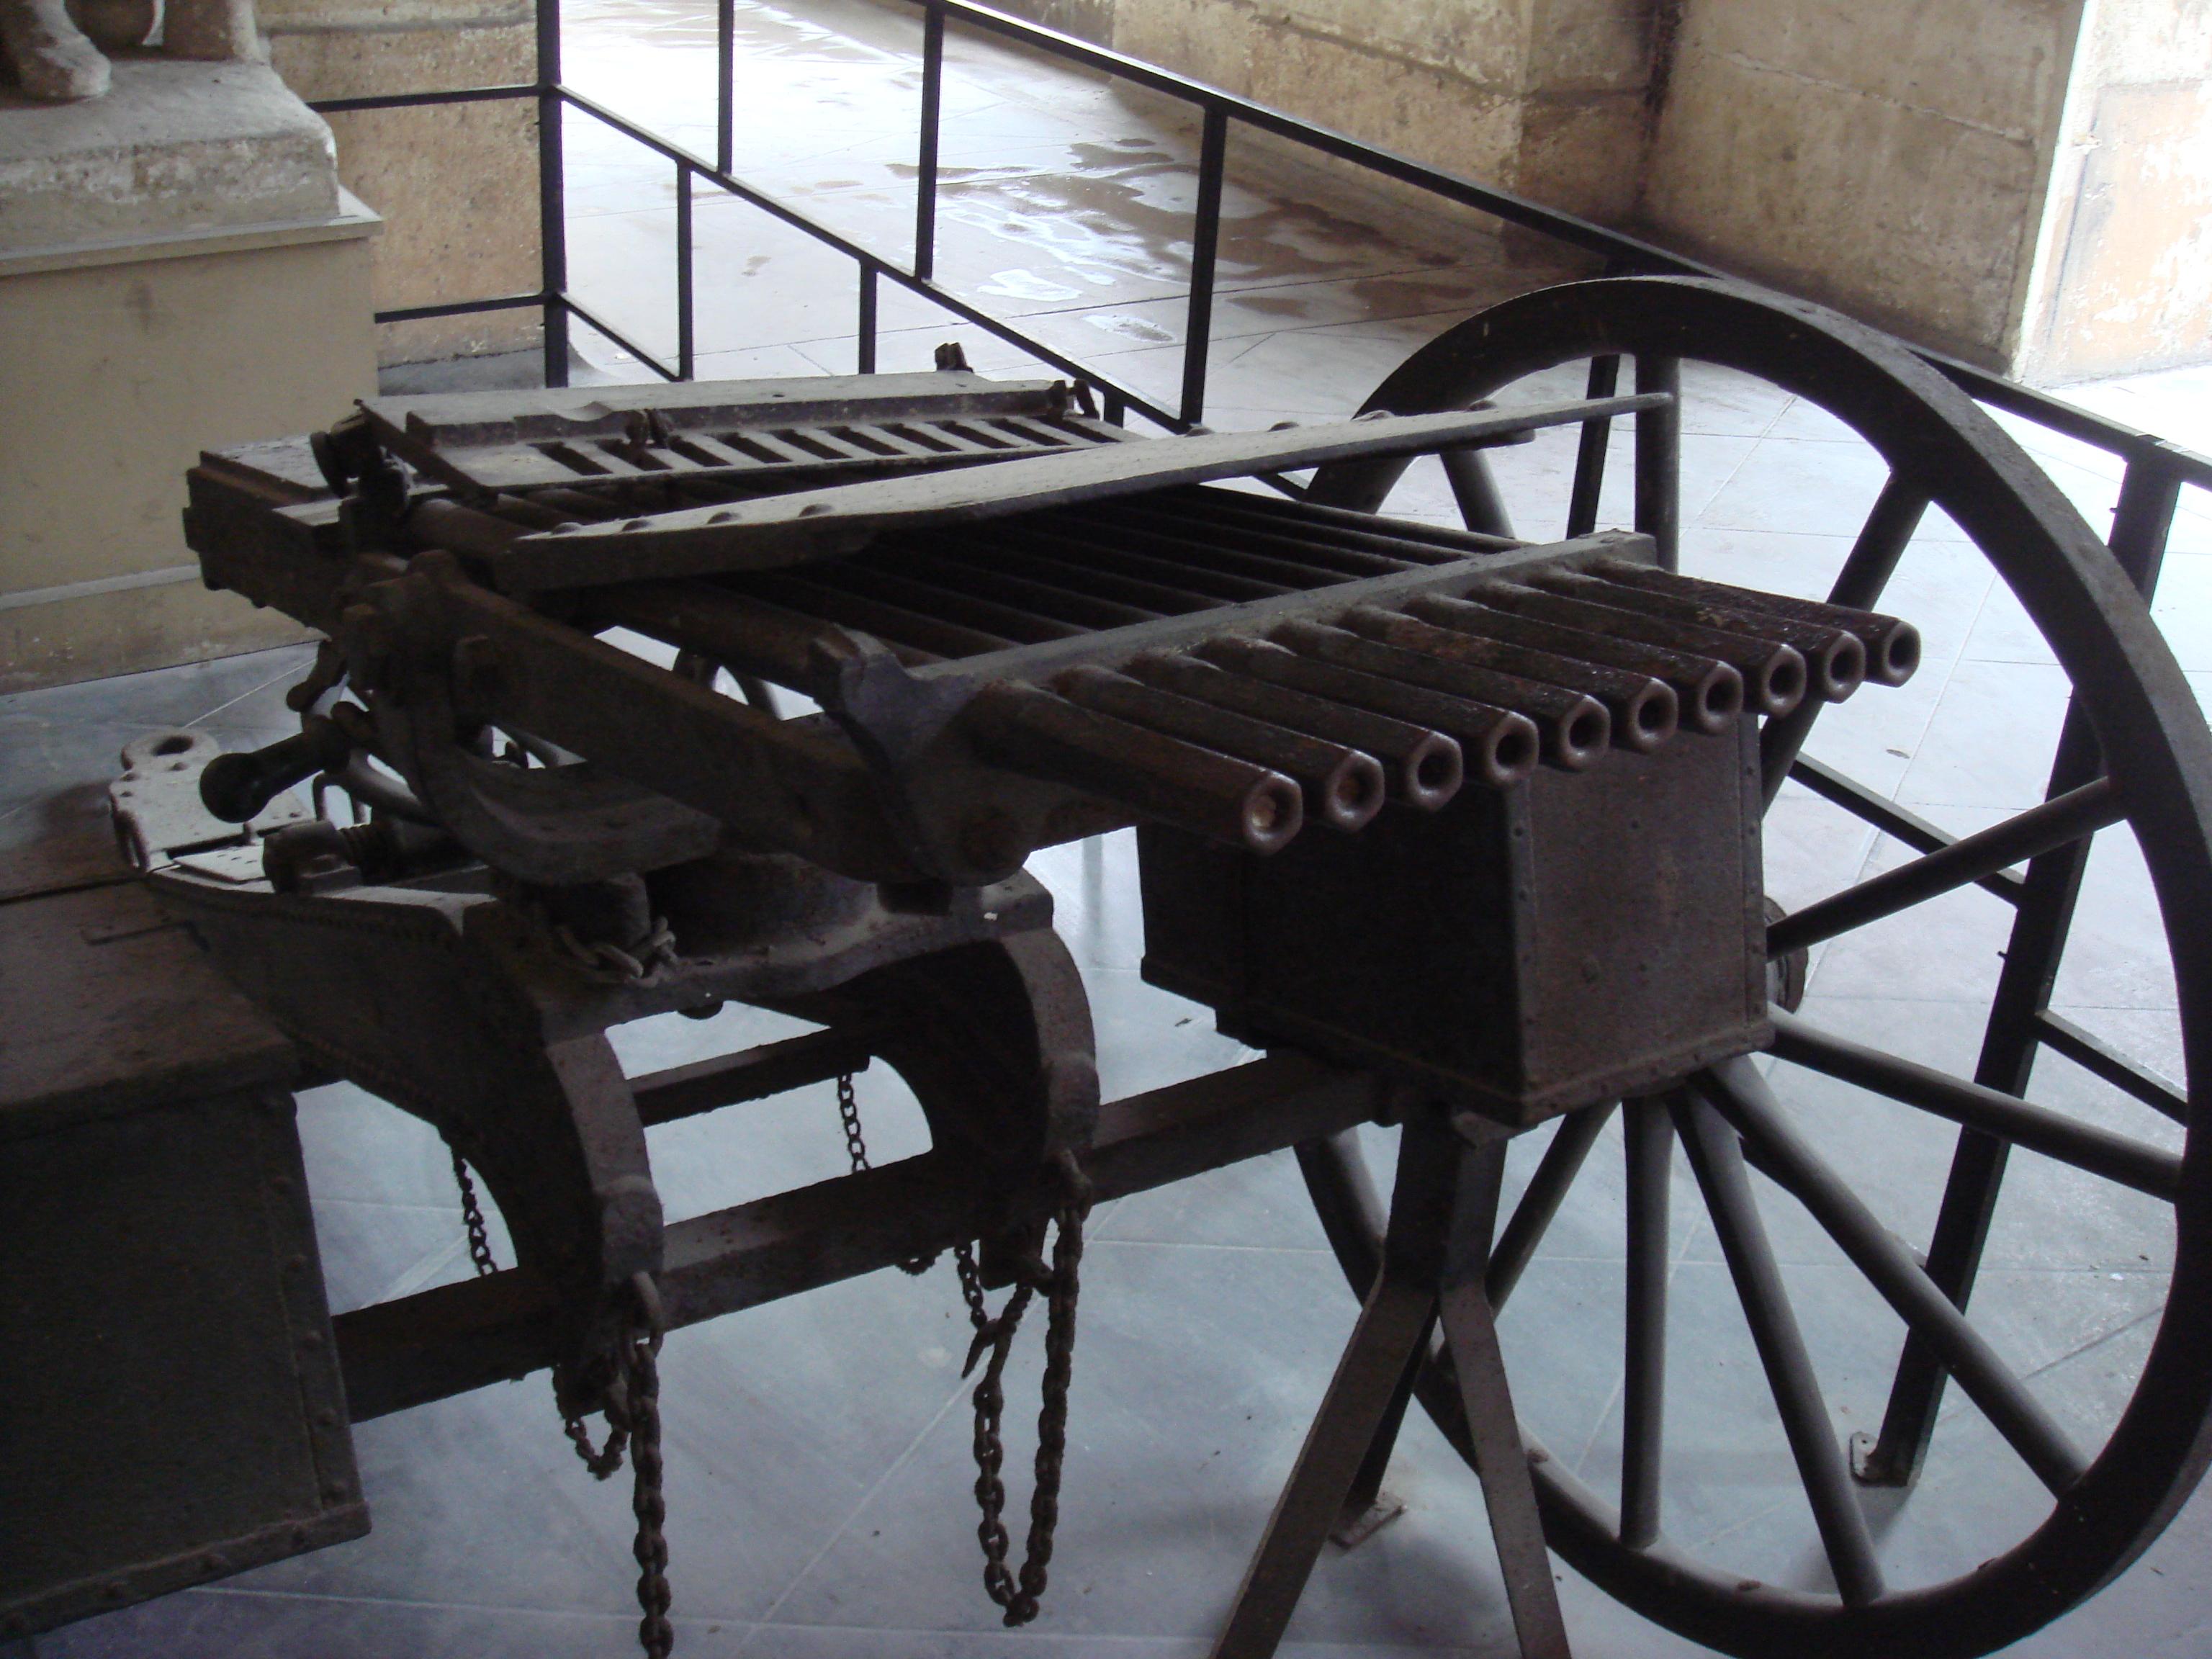 machine gun barrels